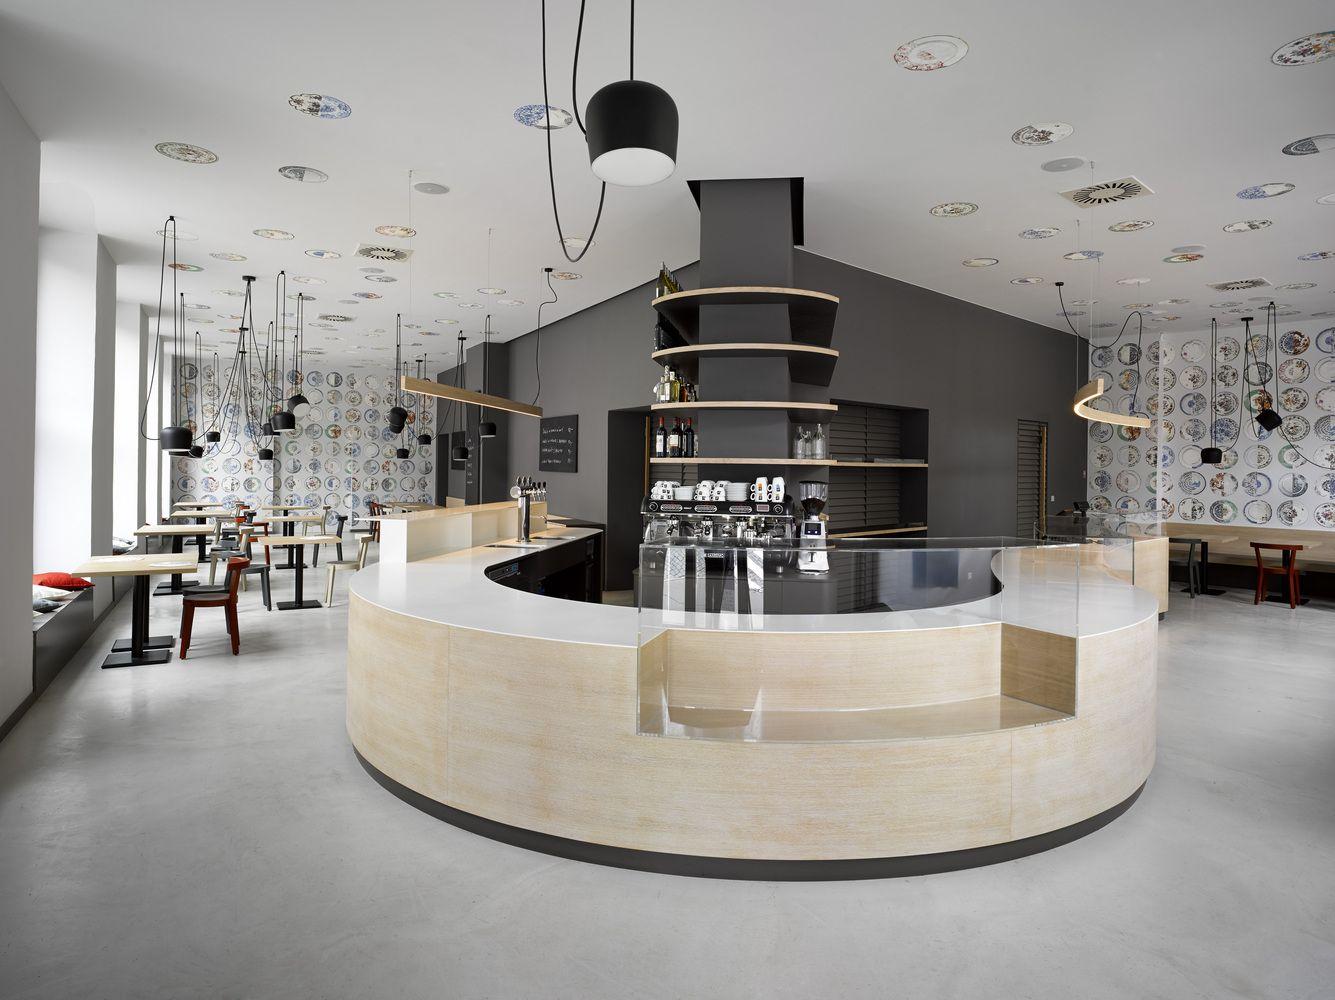 Cafe in prague proves minimalist interiors can be playful gallery of cafe bistro bakery zahorsky jra jarousek rochova architekti 3